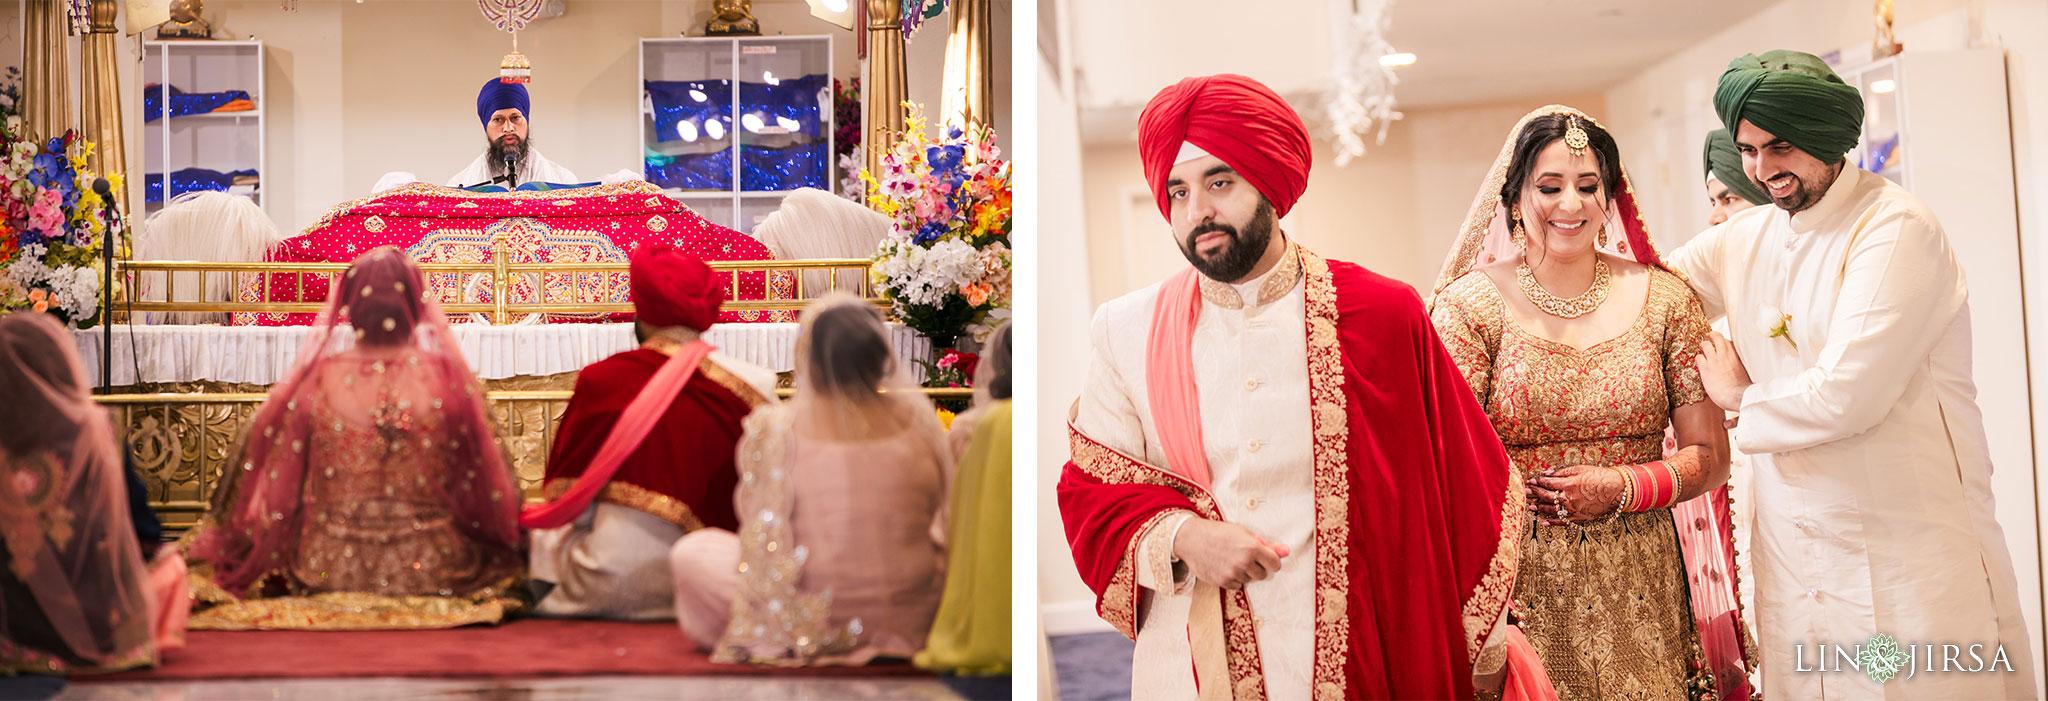 030 san francisco sikh center punjabi wedding photography